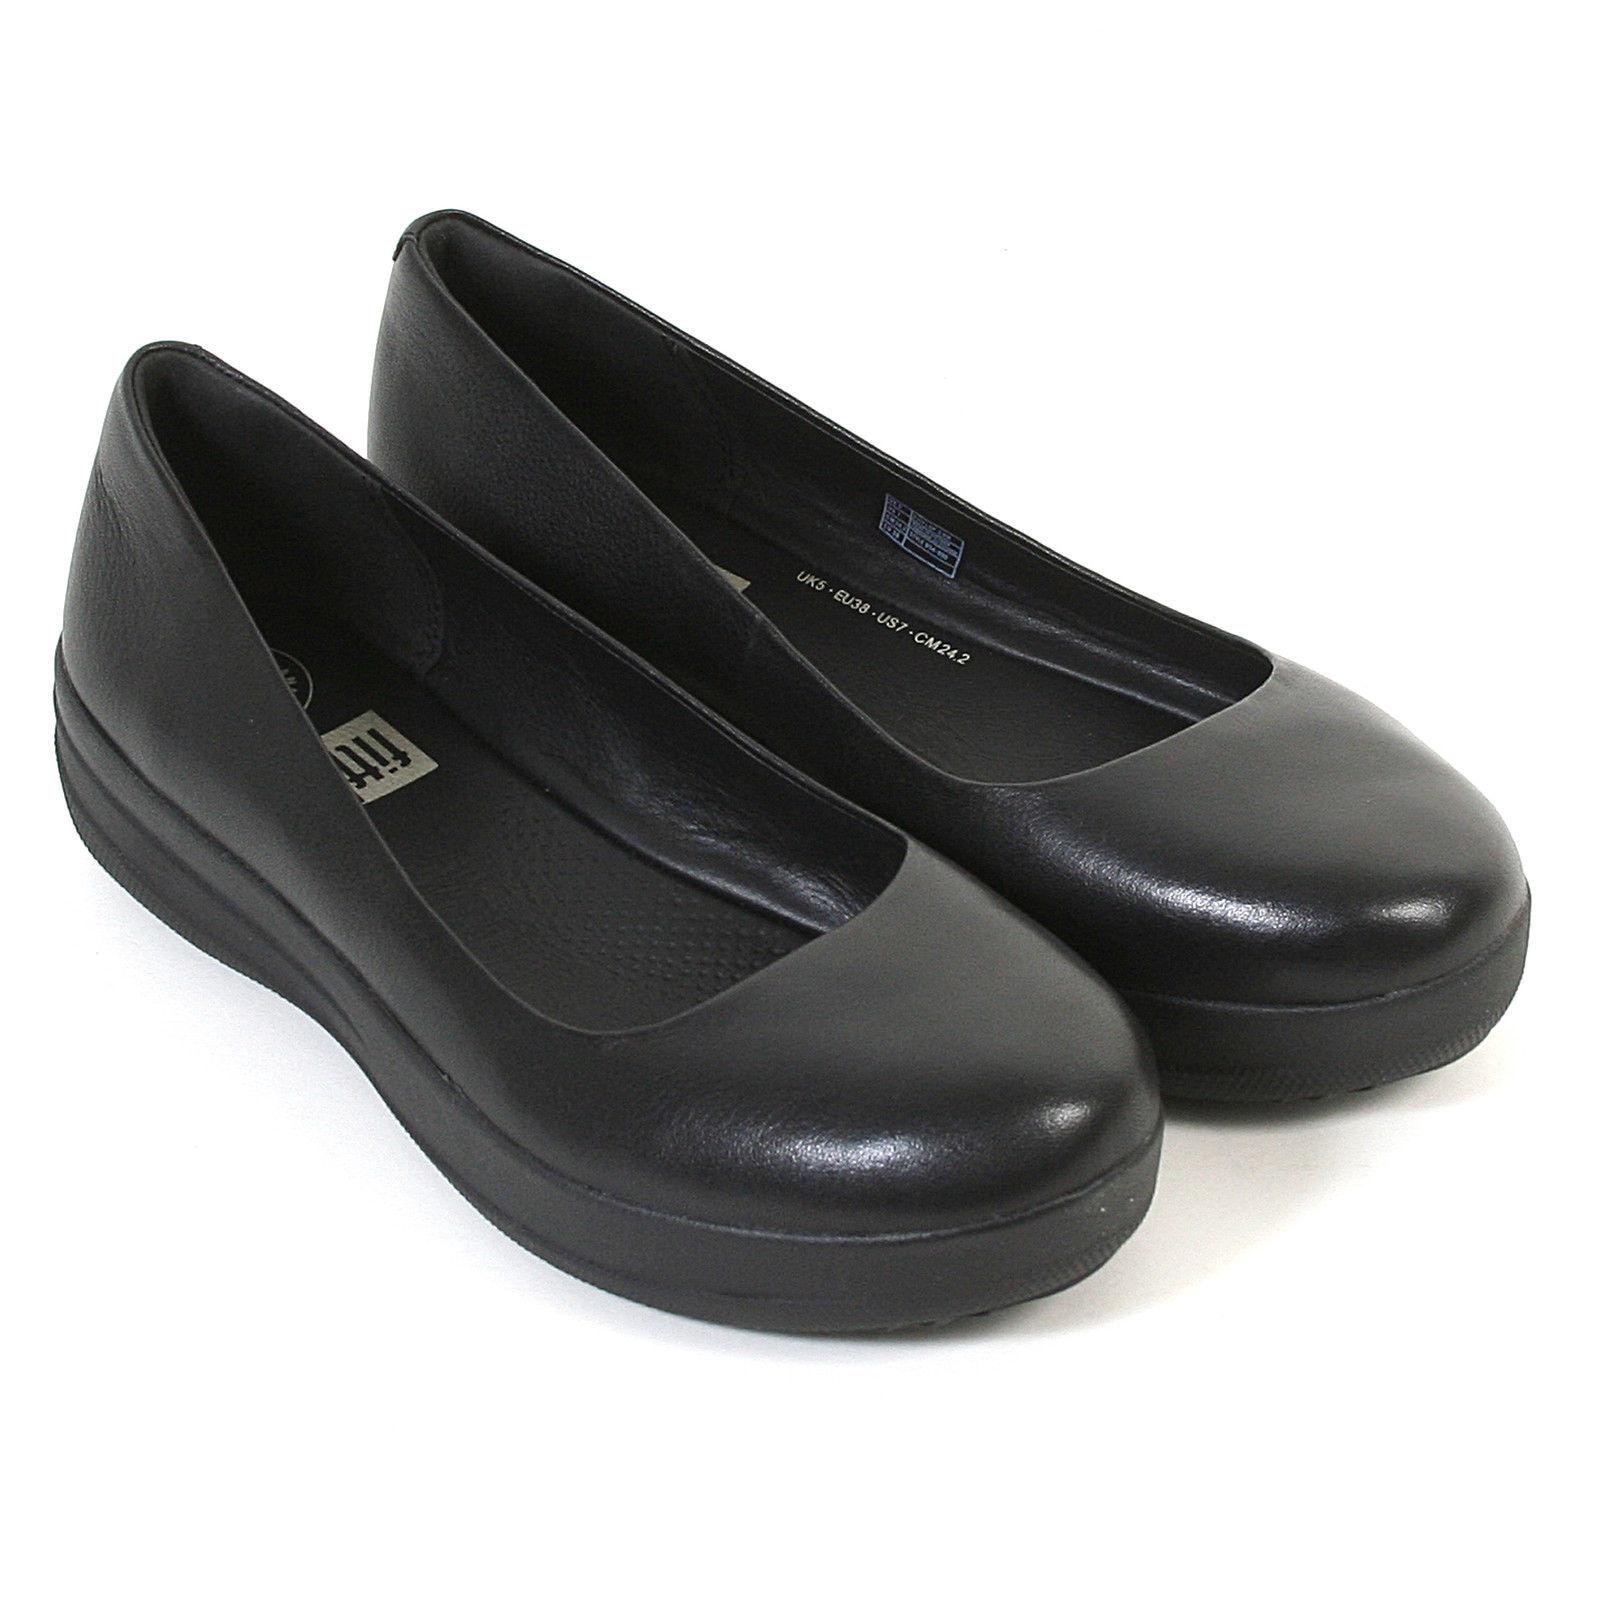 Brand New Girl/'s Fashion Glitter Flats Dress Shoes Size 9-4